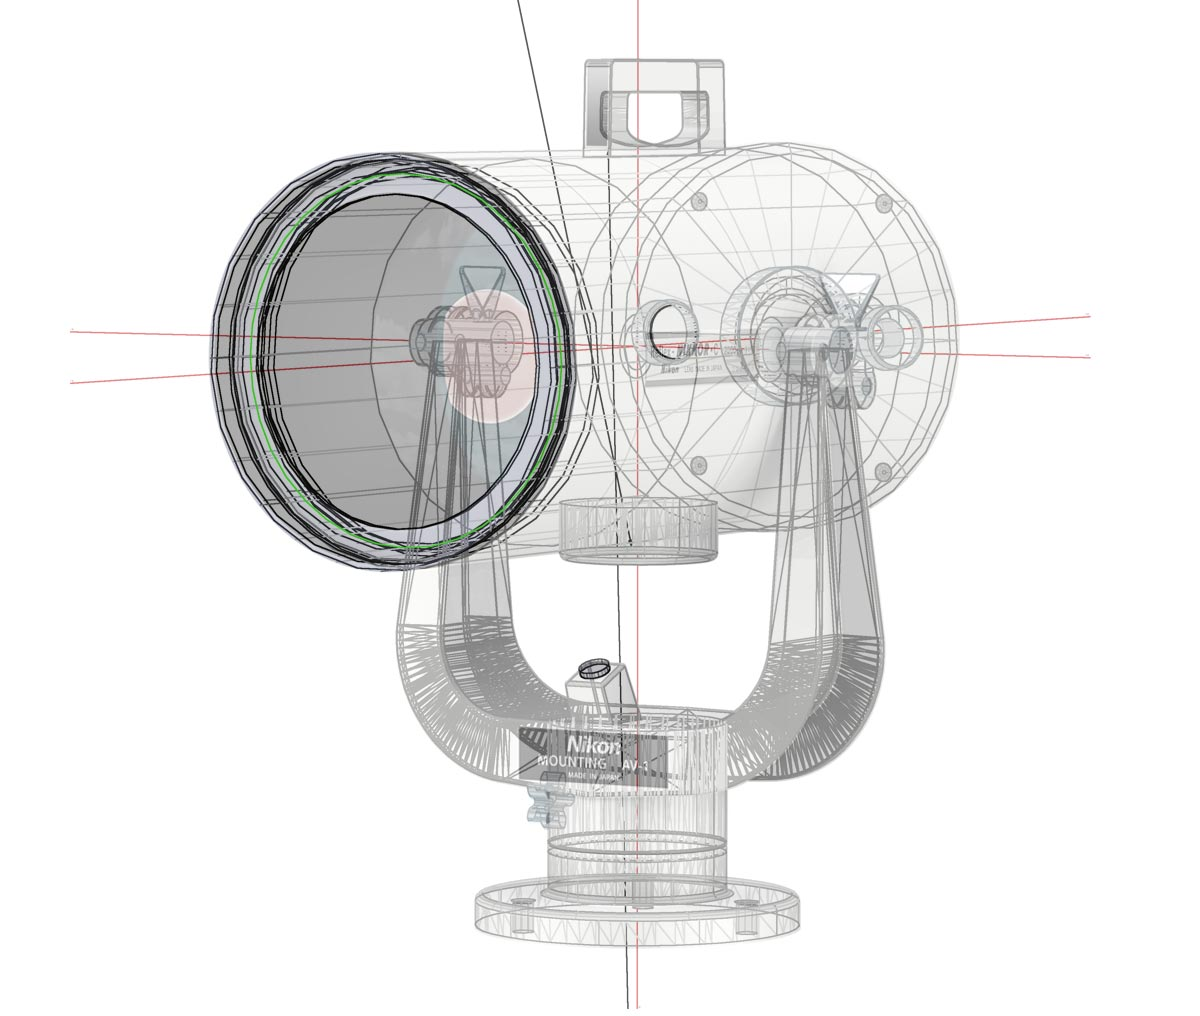 nikon illustration 2000mm lens